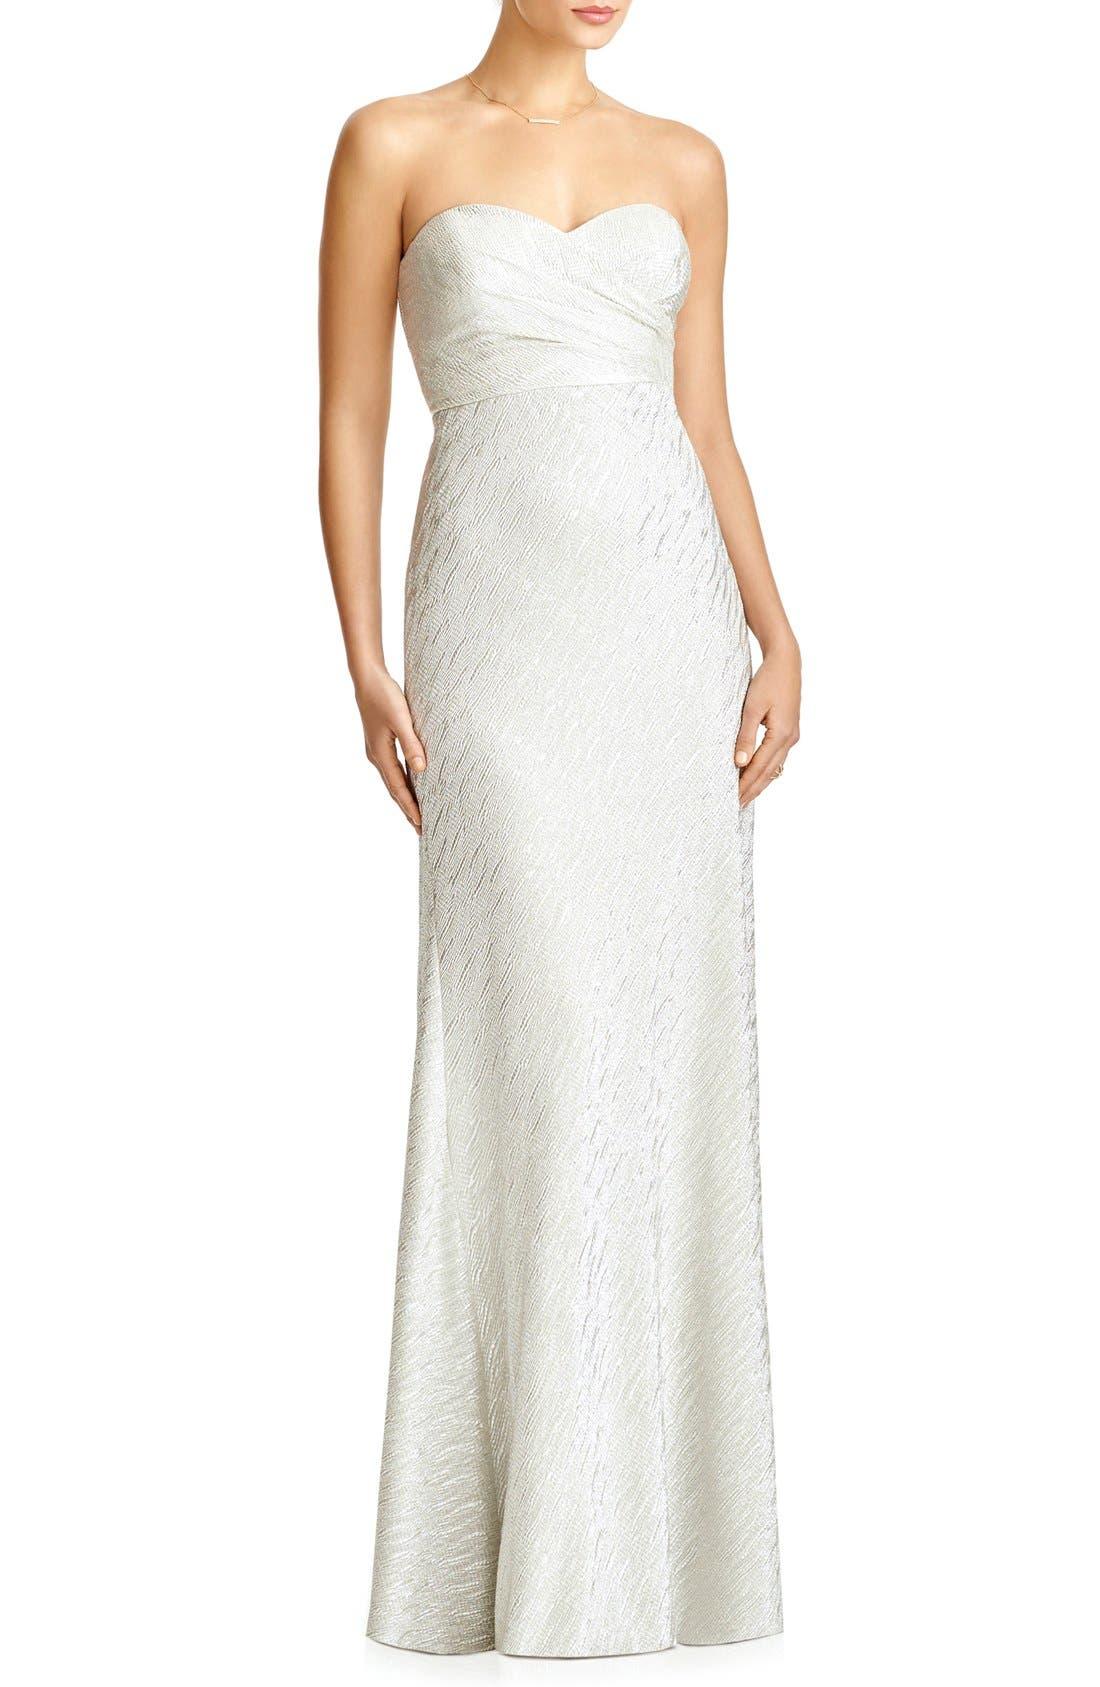 'Soho' Metallic Strapless Empire Waist Gown, Main, color, 020